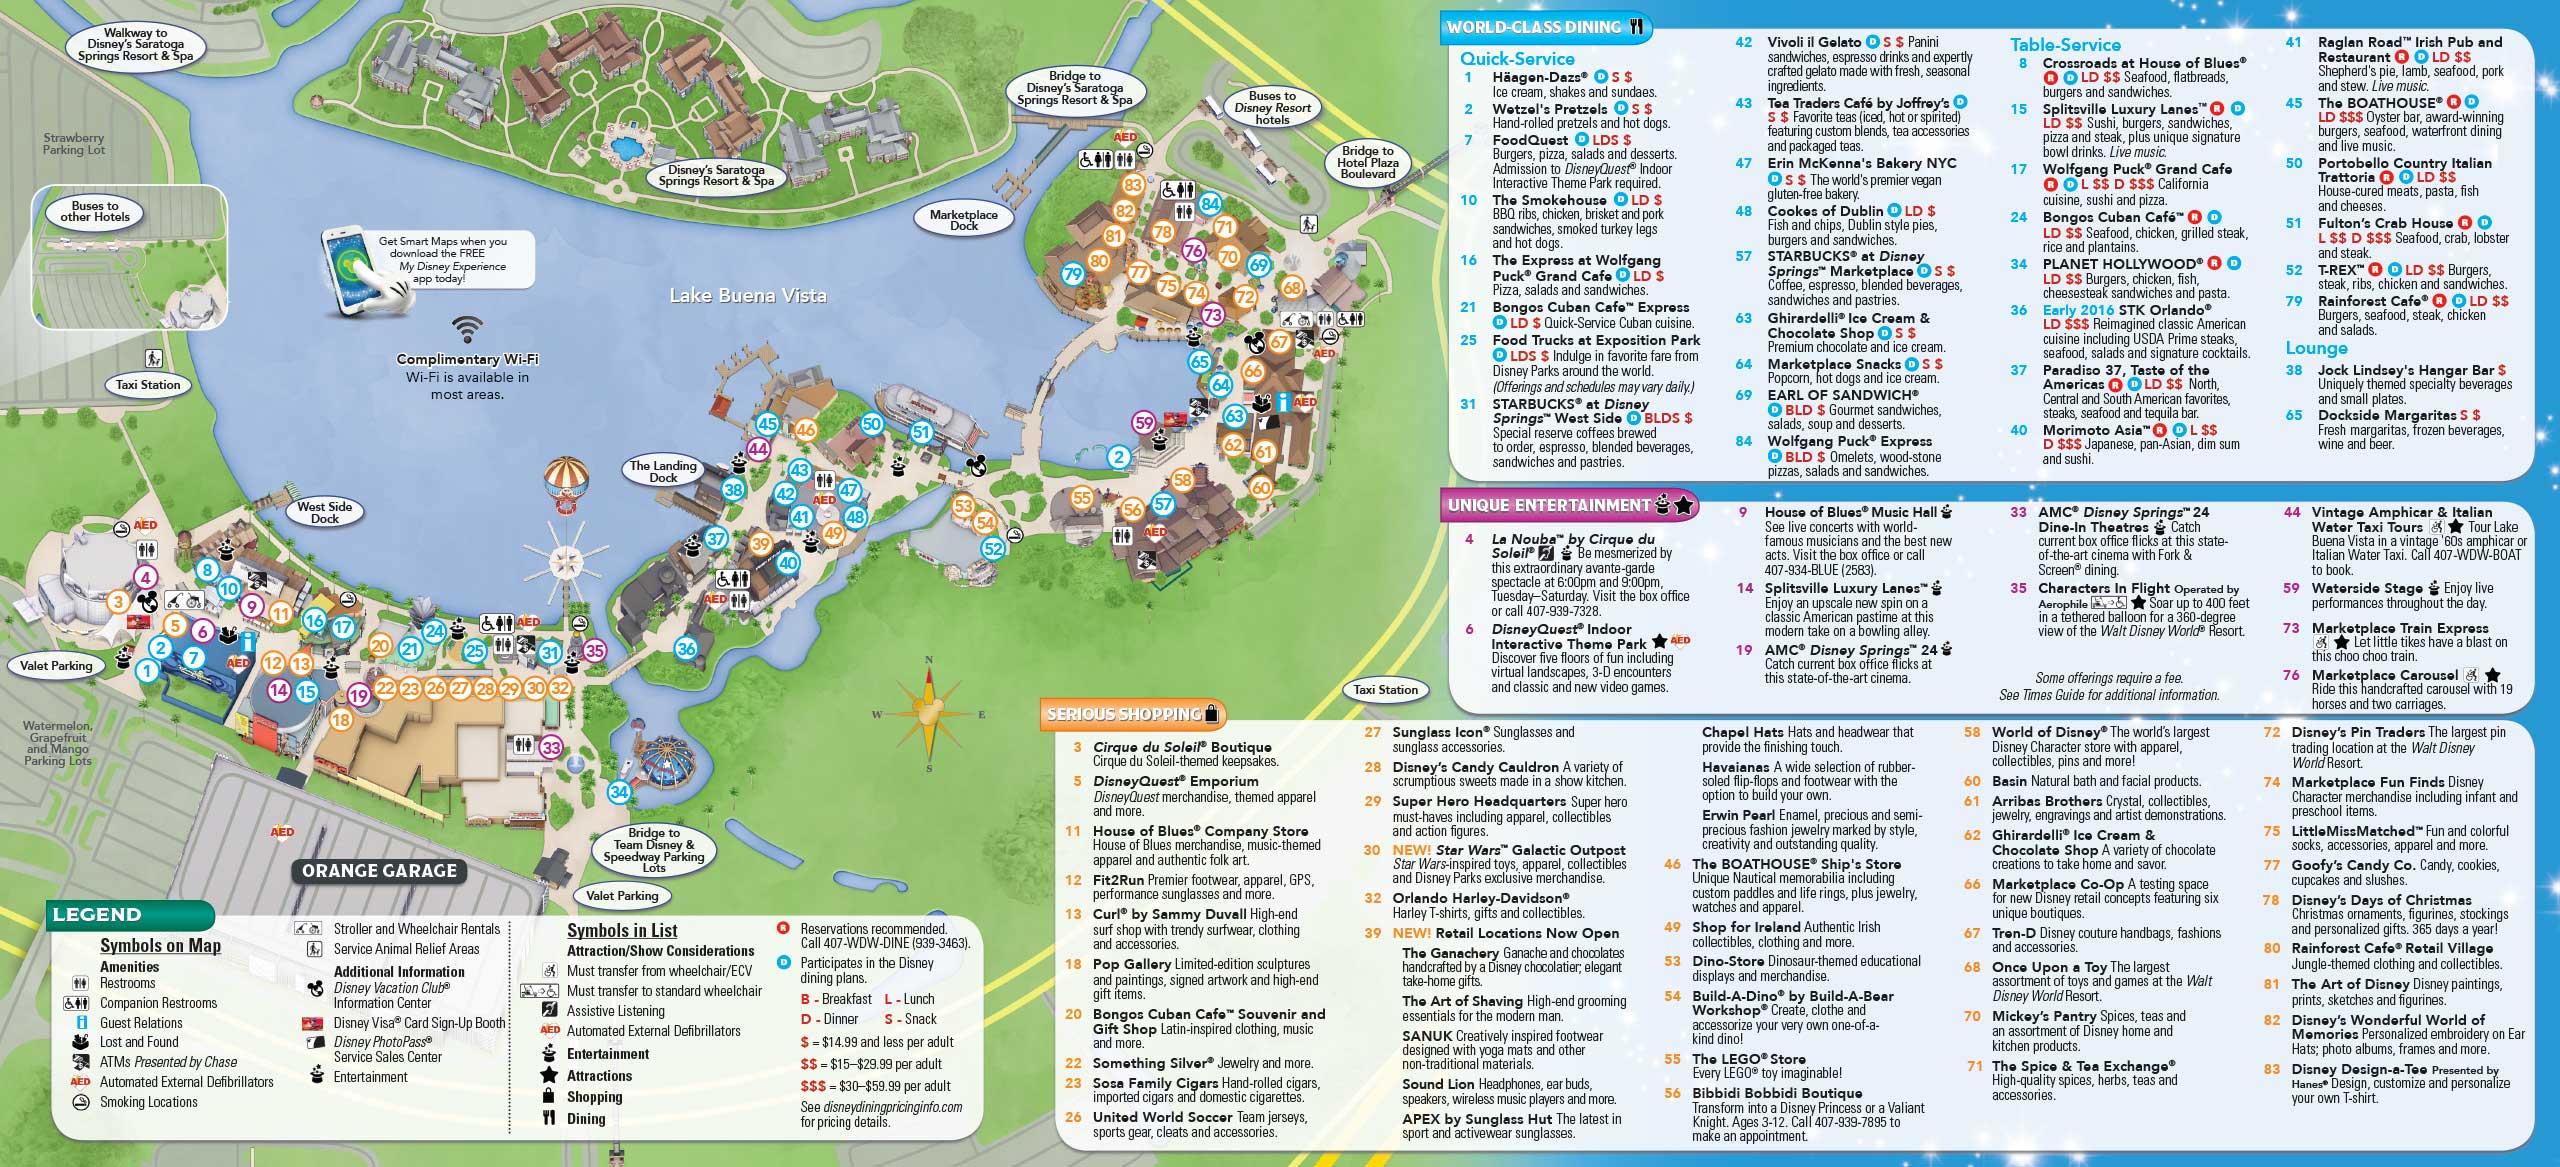 January 2016 Walt Disney World Park Maps - Photo 10 of 12